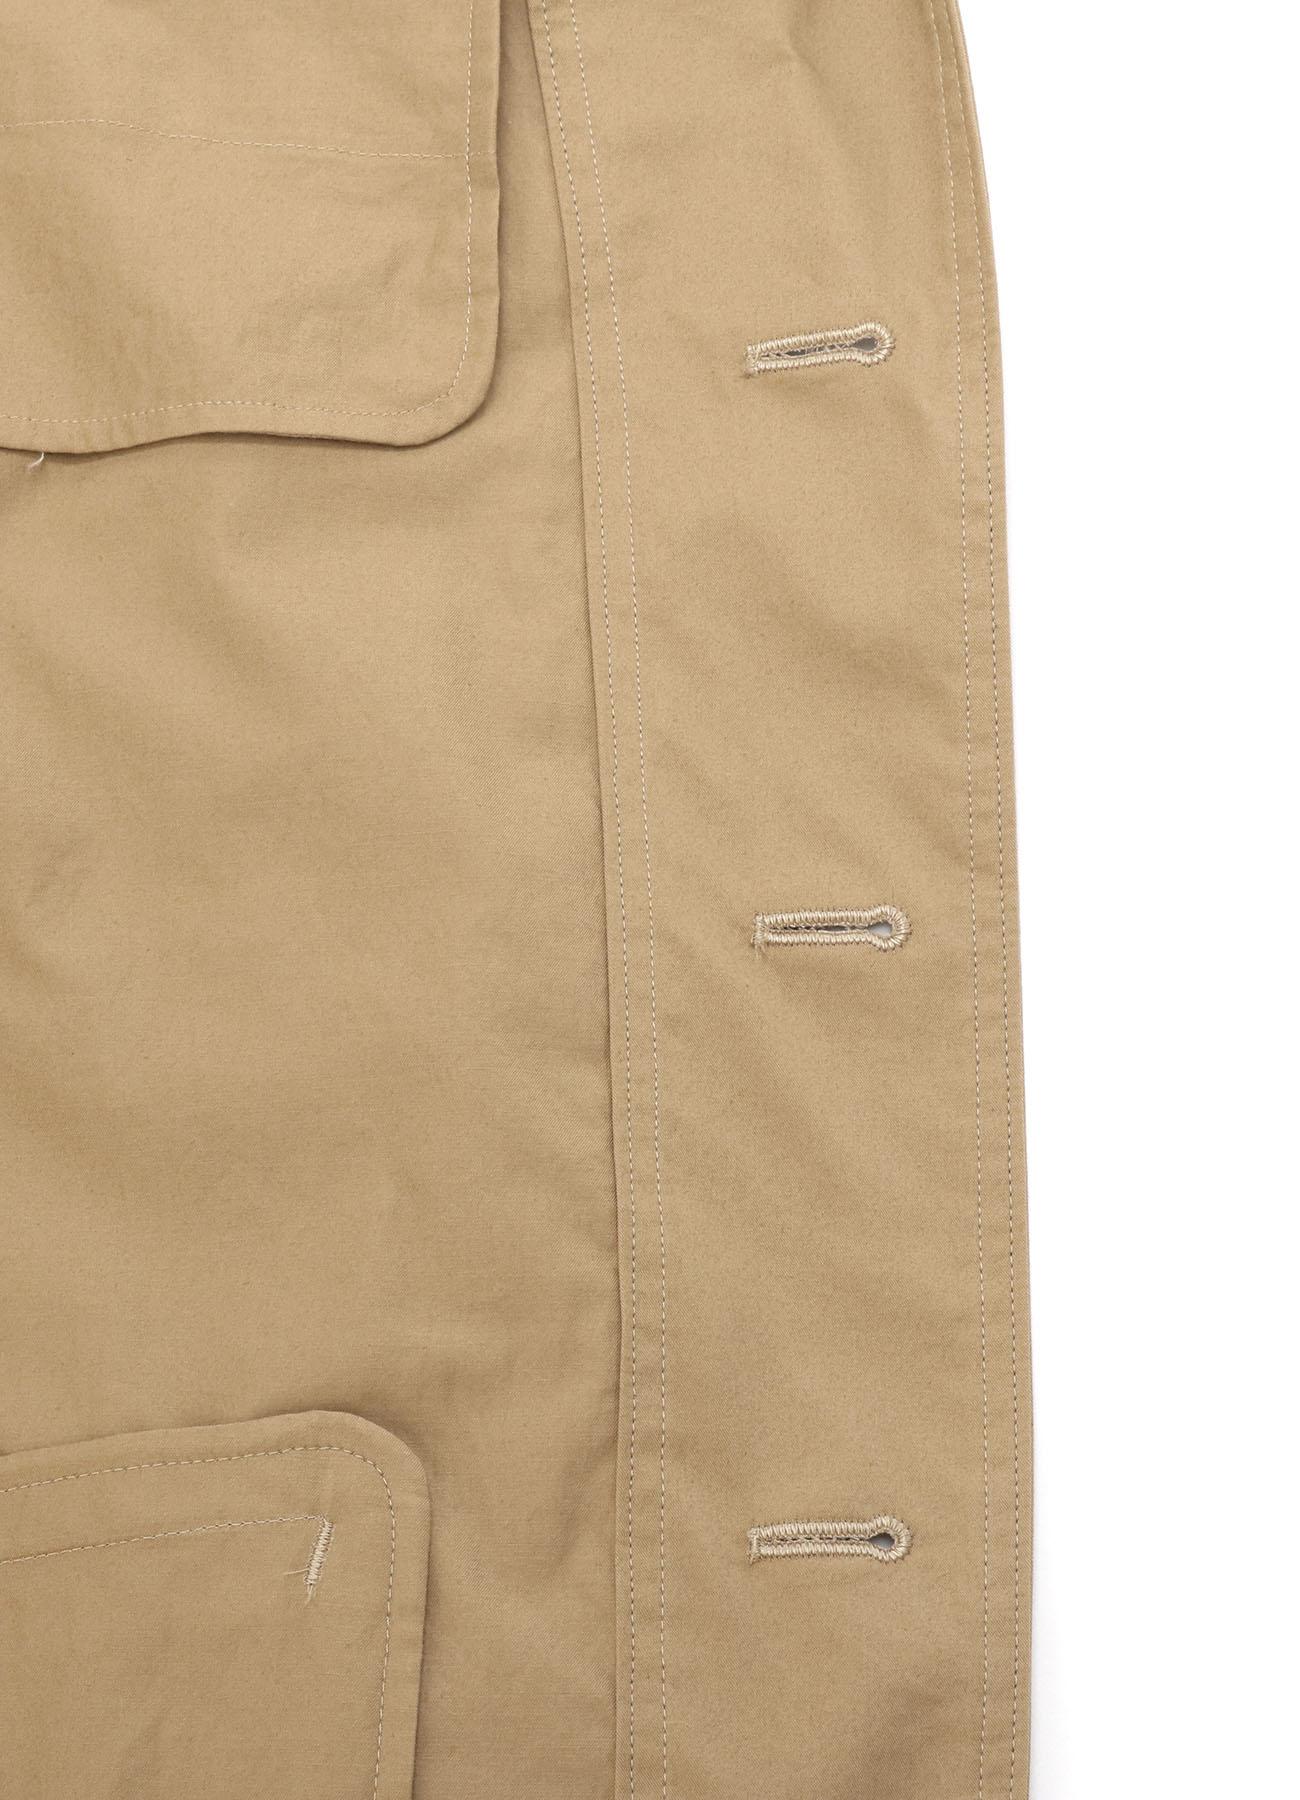 Cotton Twill 3BS Tailored Shirt Jacket